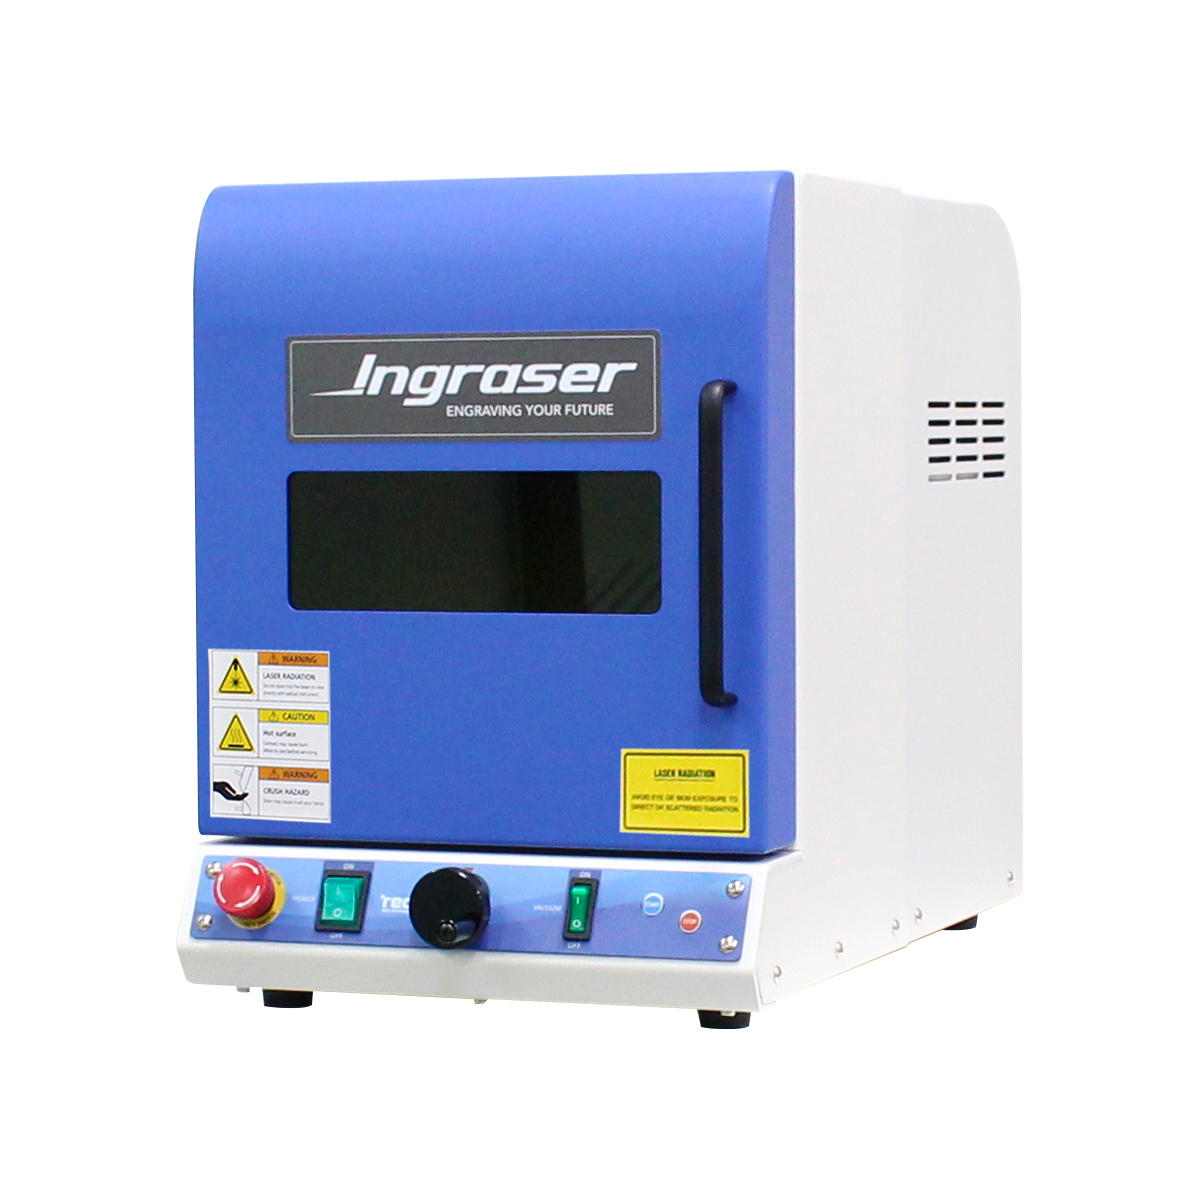 Lasergraveermachine L50 Ingraser - voor markering